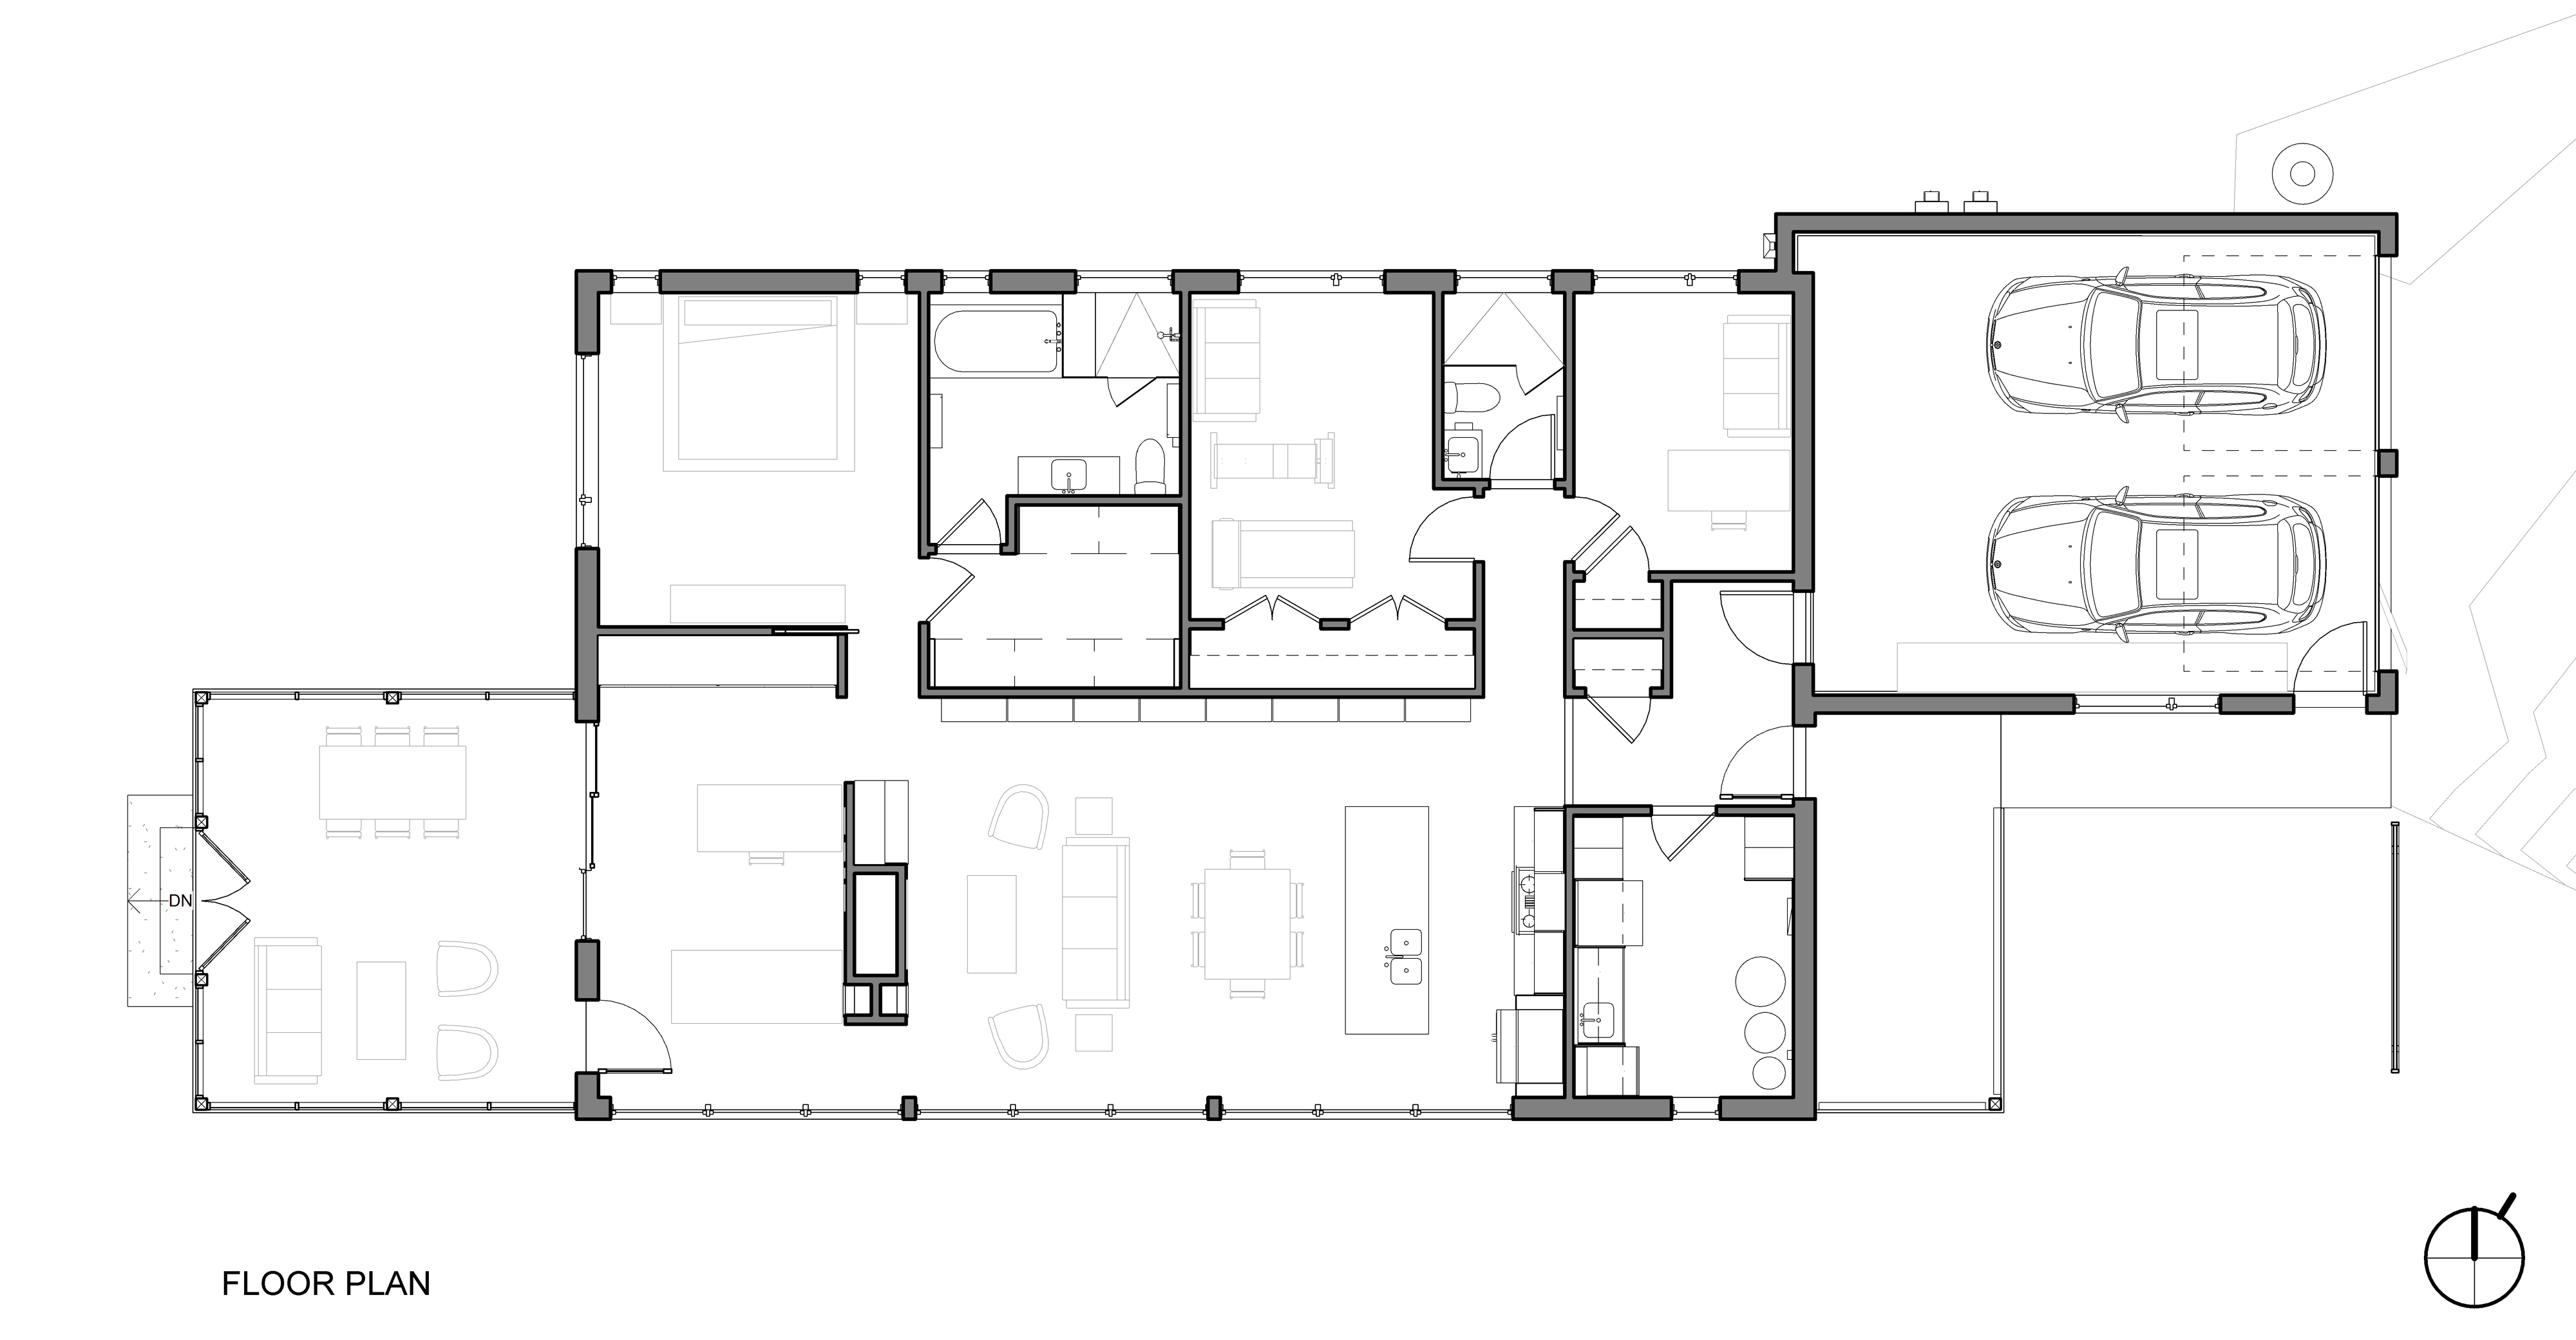 100 1 floor plan floor plans mira oasis reem by for 100 floors floor 35